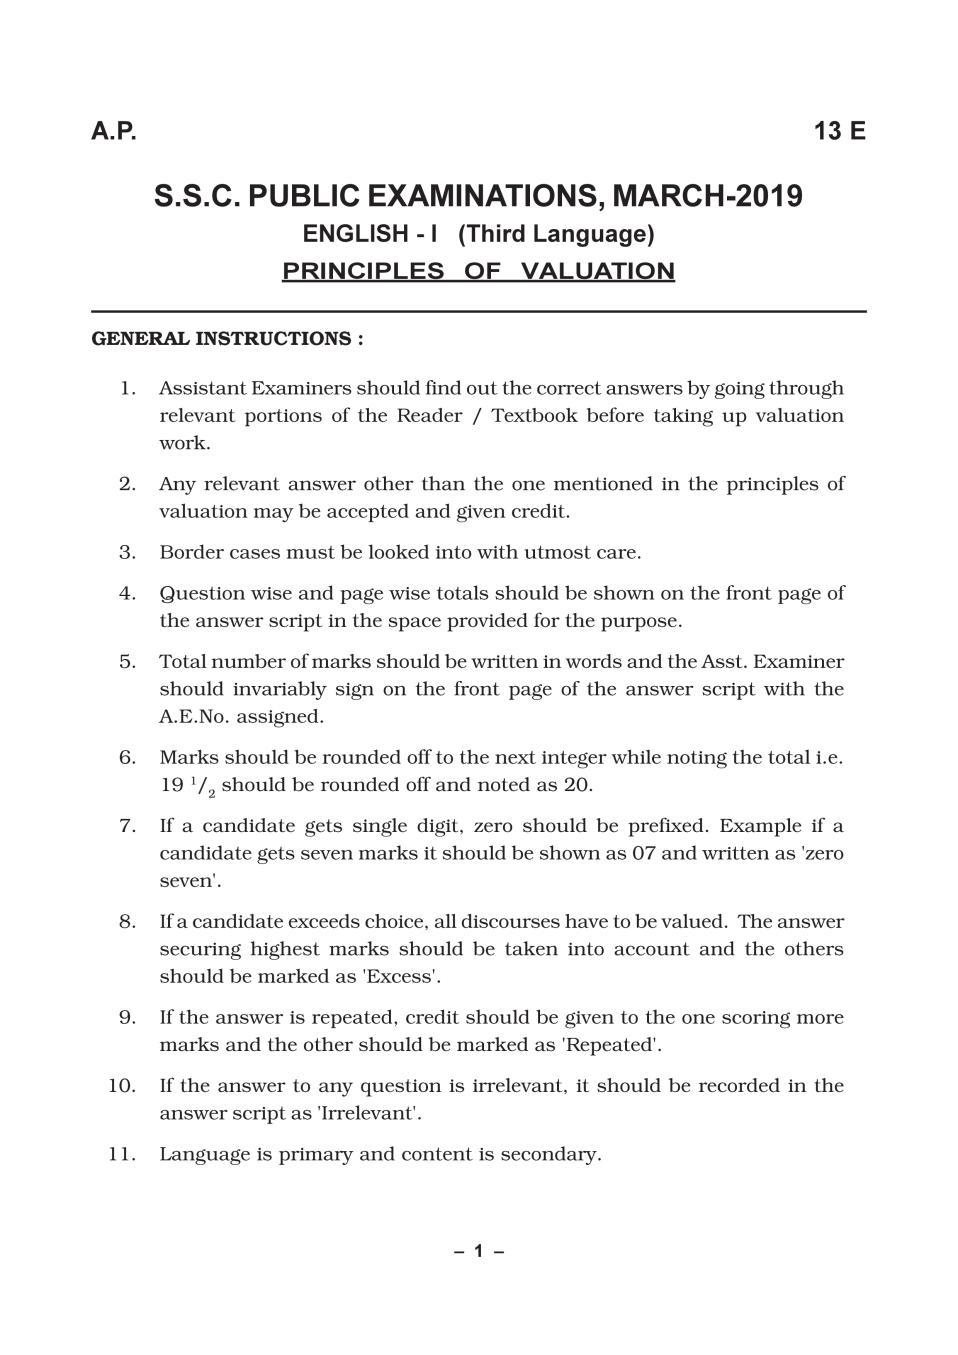 AP 10th Class Marking Scheme 2019 English - Paper 1 (3rd Language) - Page 1